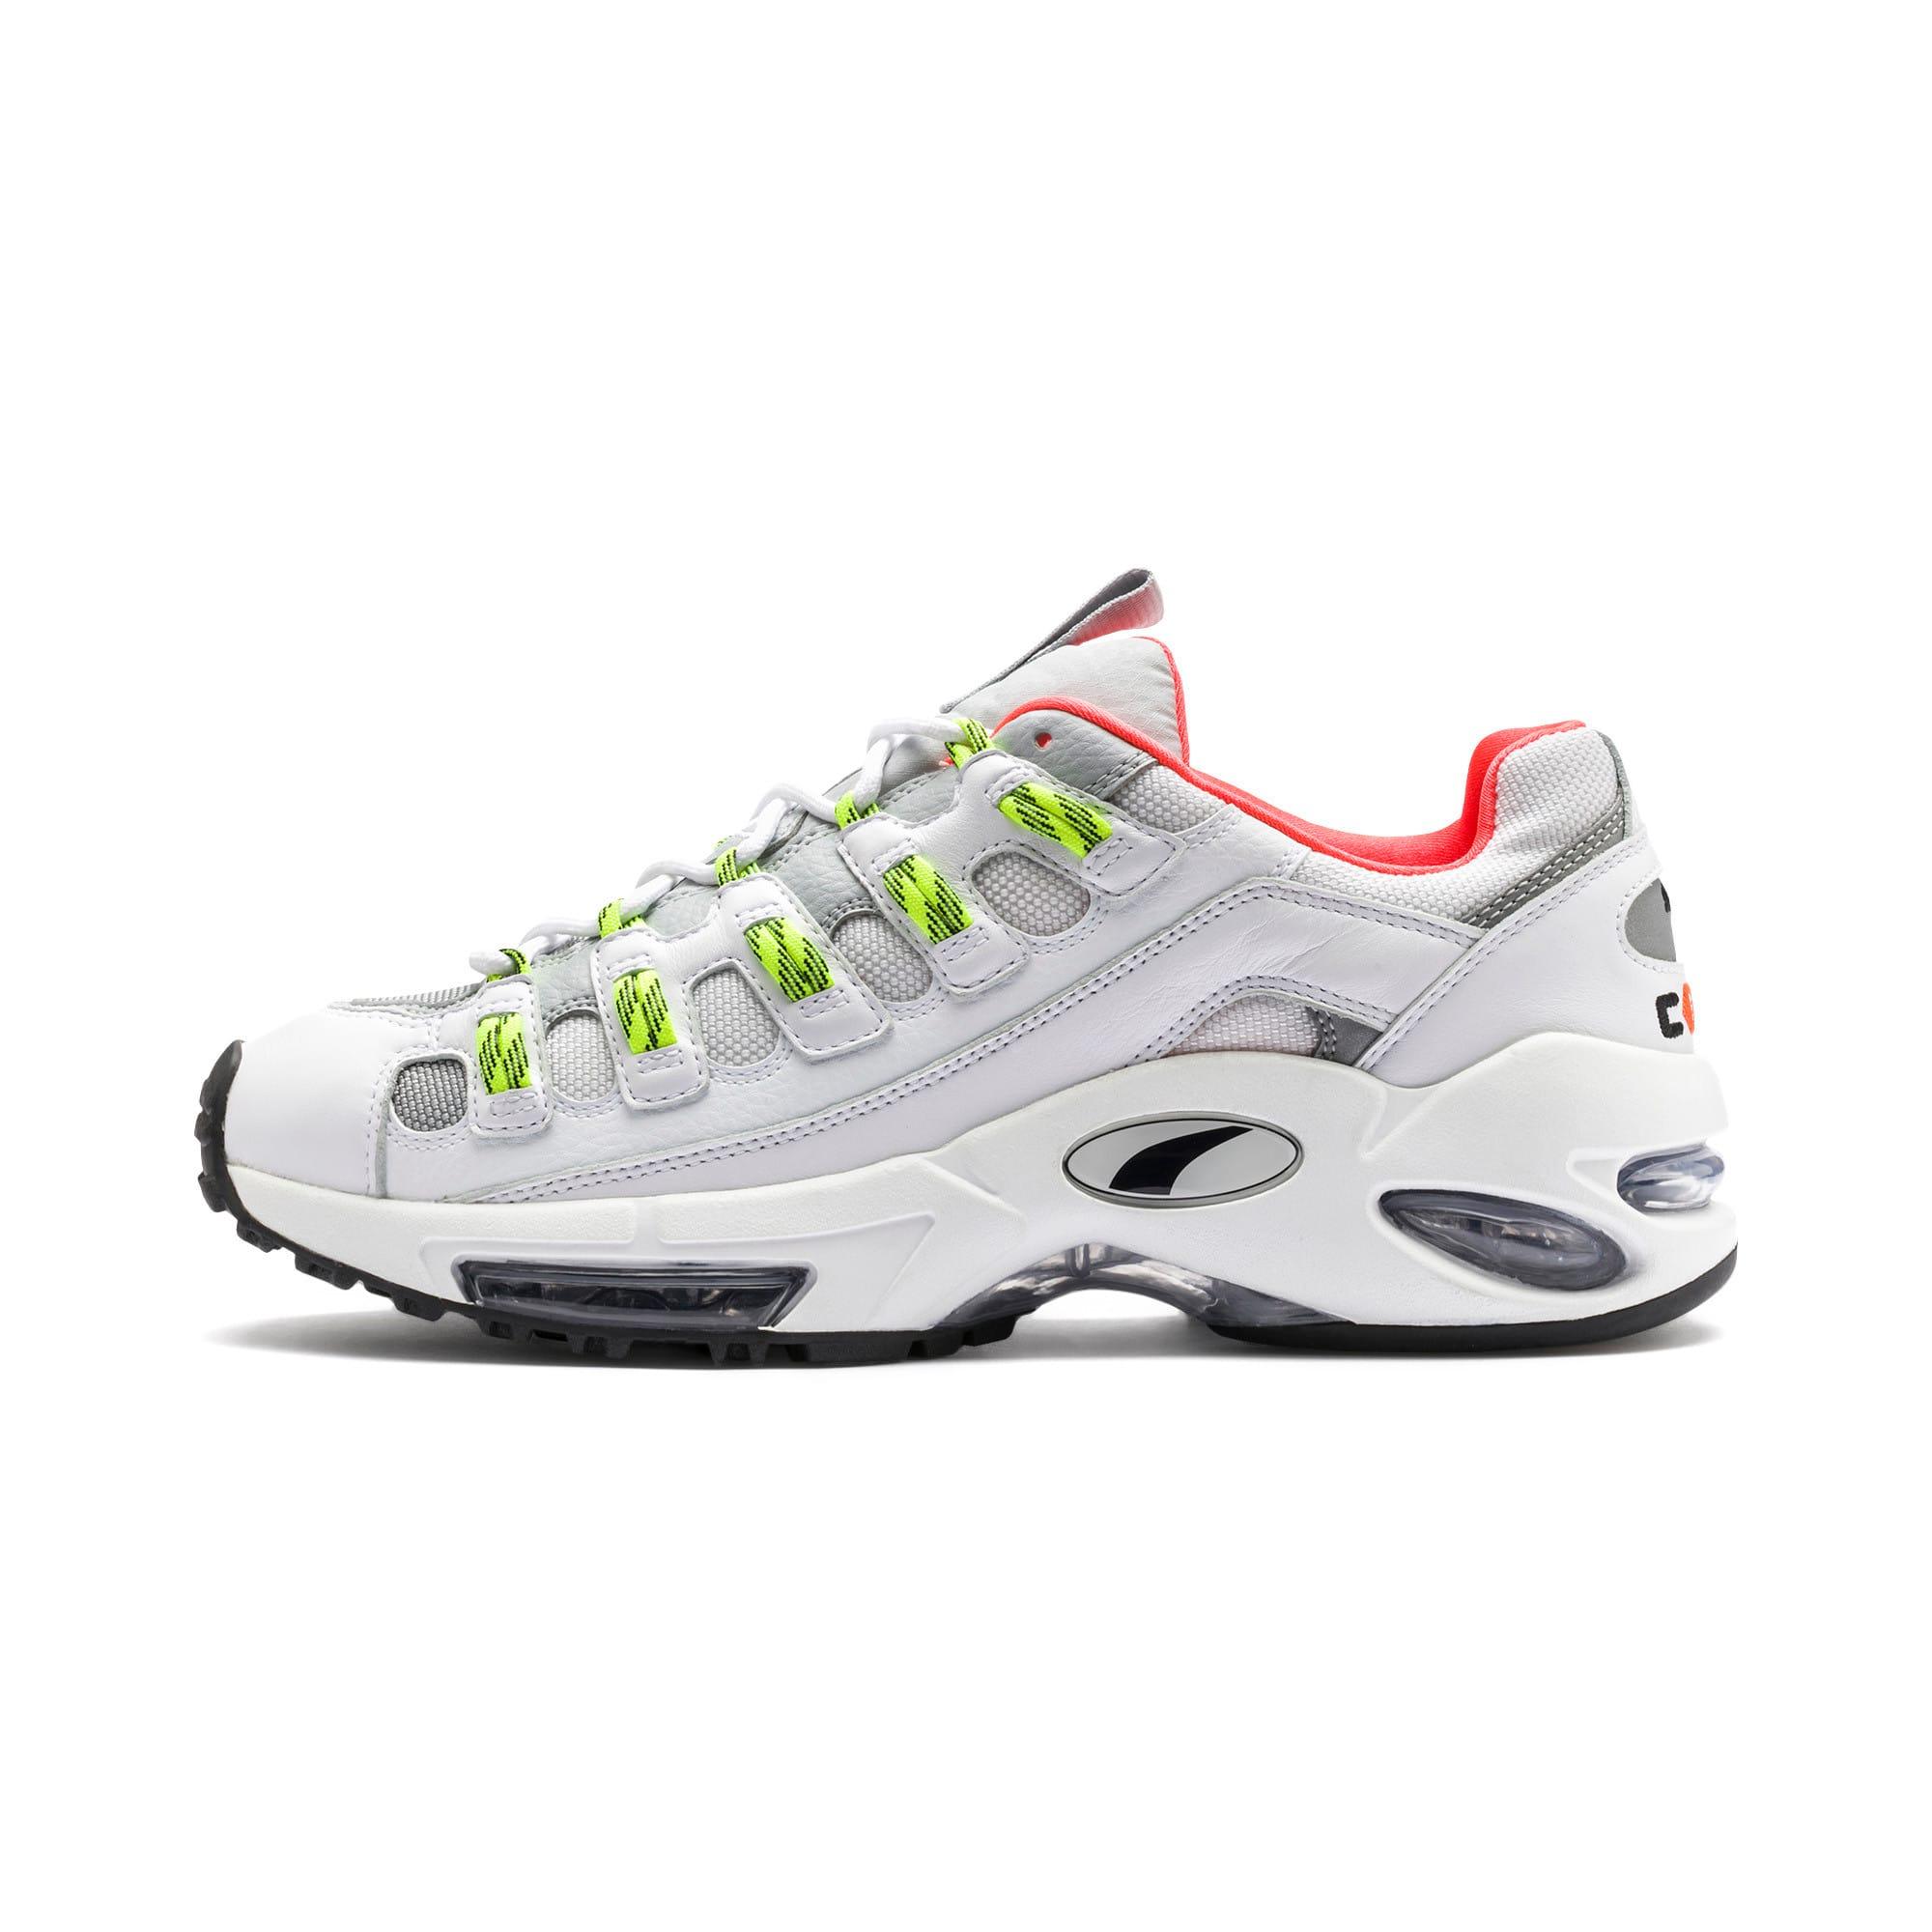 Thumbnail 1 of CELL Endura Rebound Sneakers, Puma White-High Rise, medium